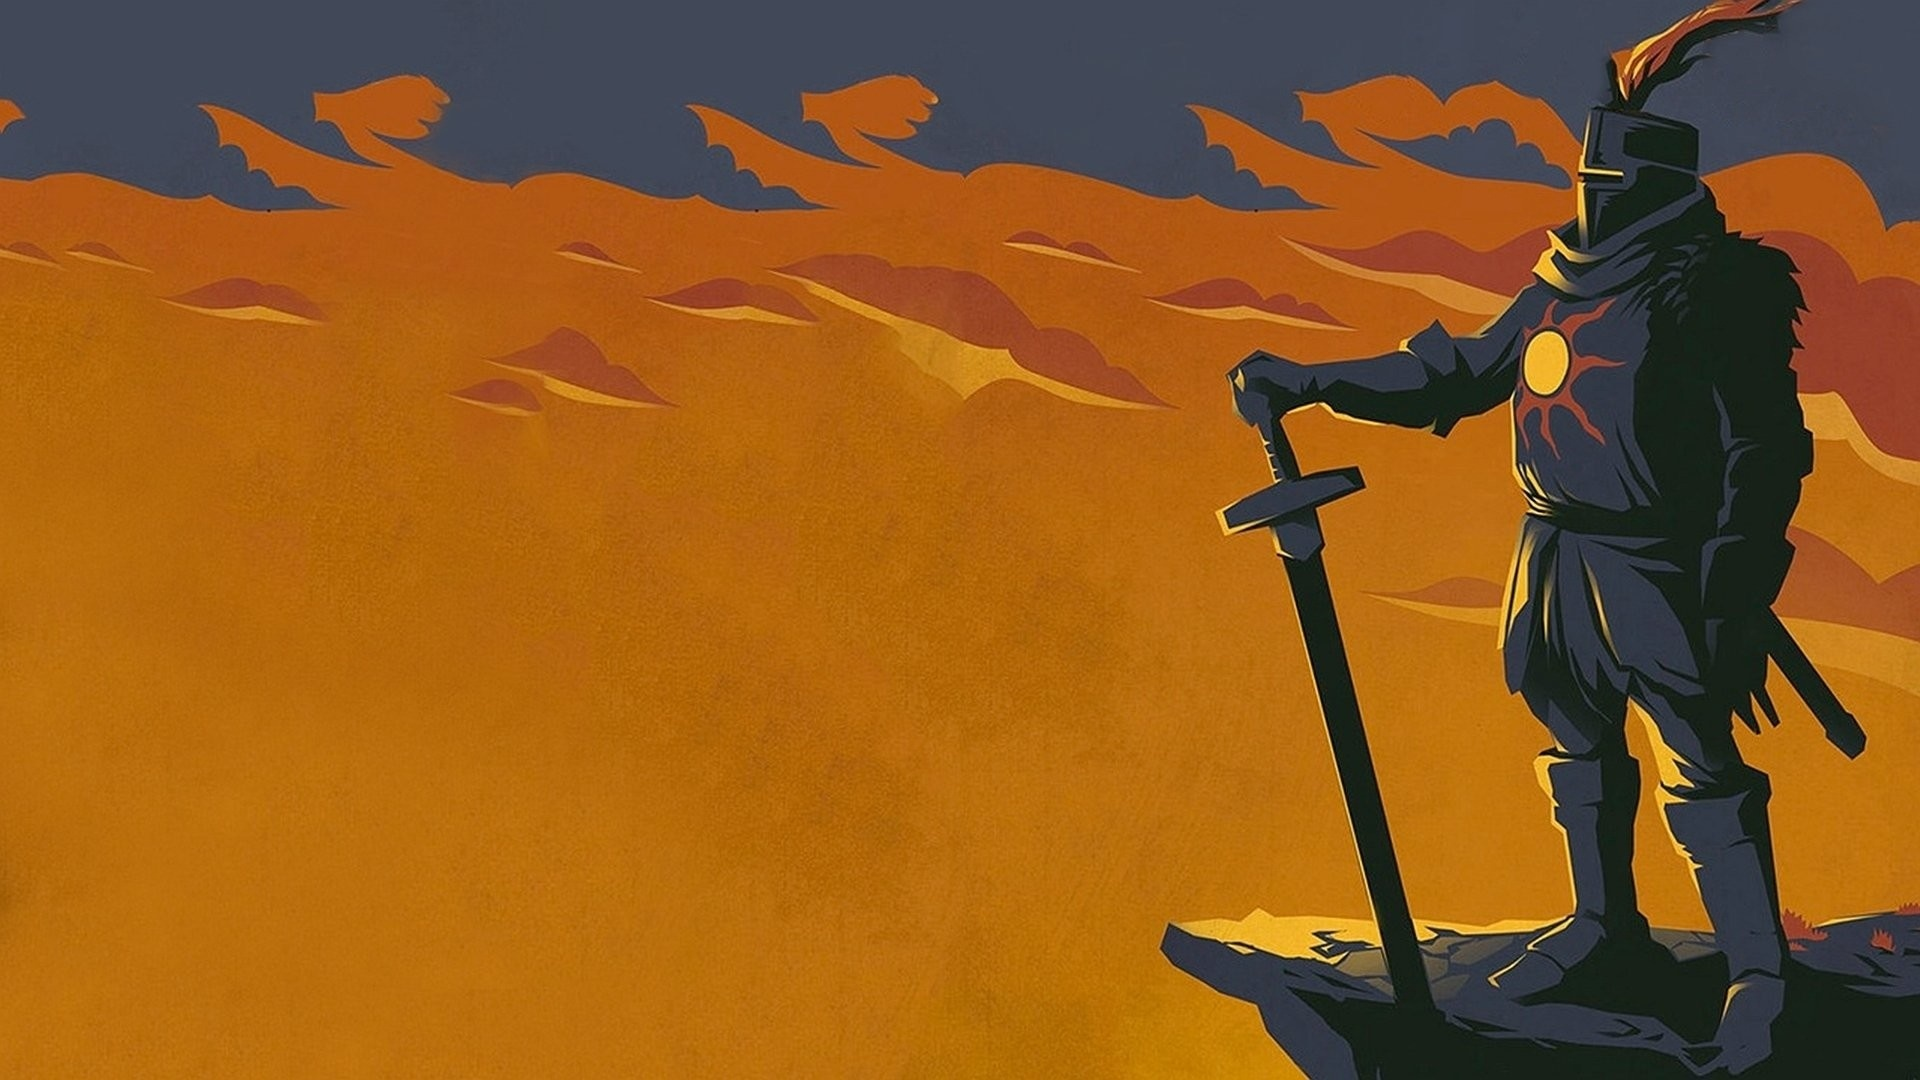 Dark Souls 3 desktop wallpaper